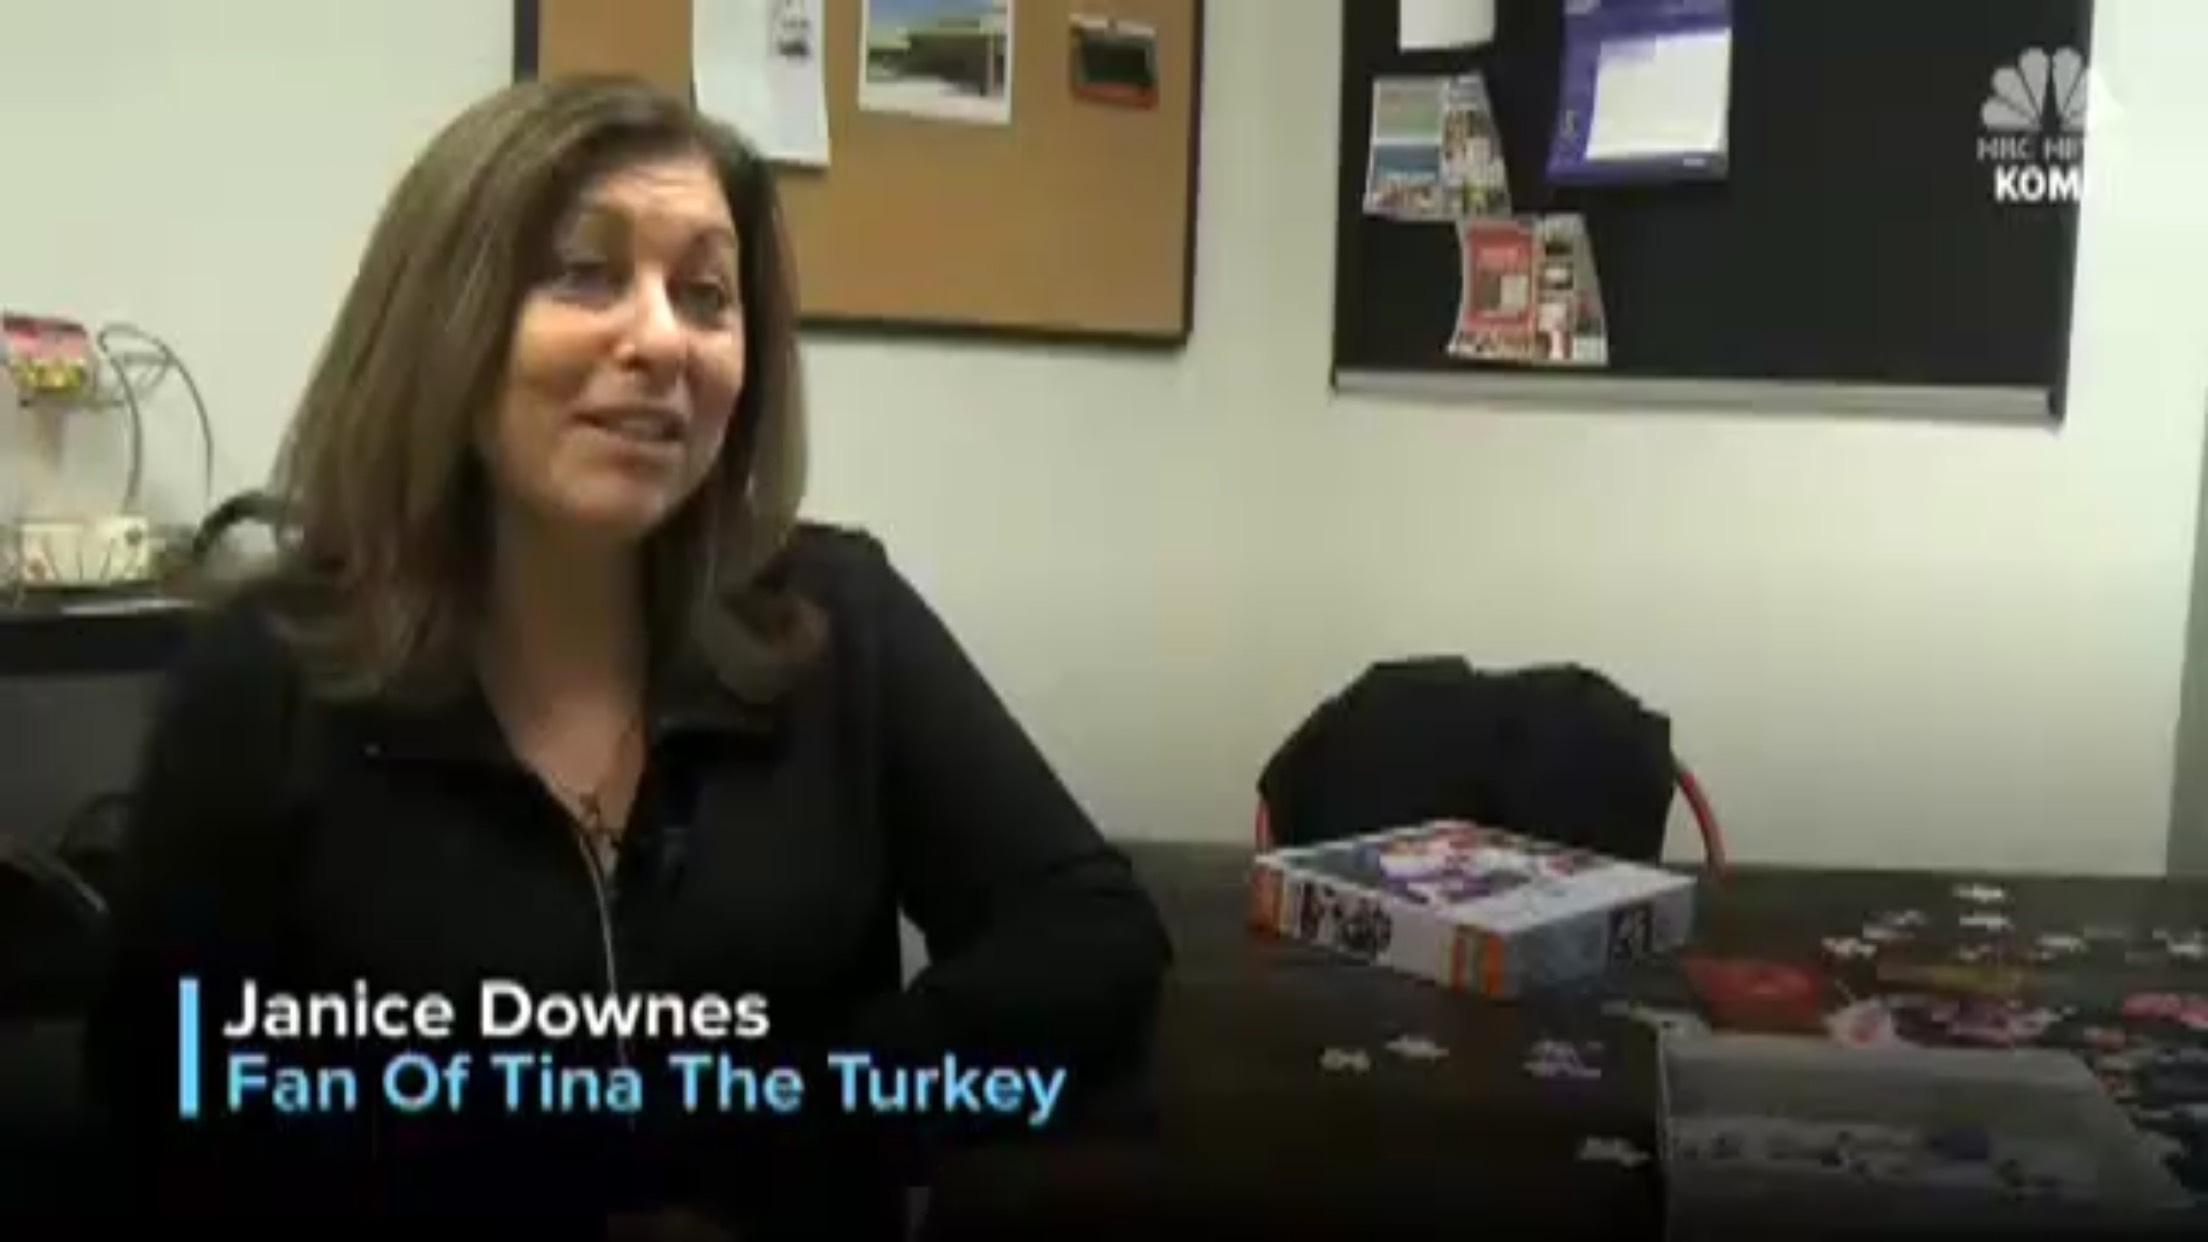 Janice Downes: Fan of Tina the Turkey